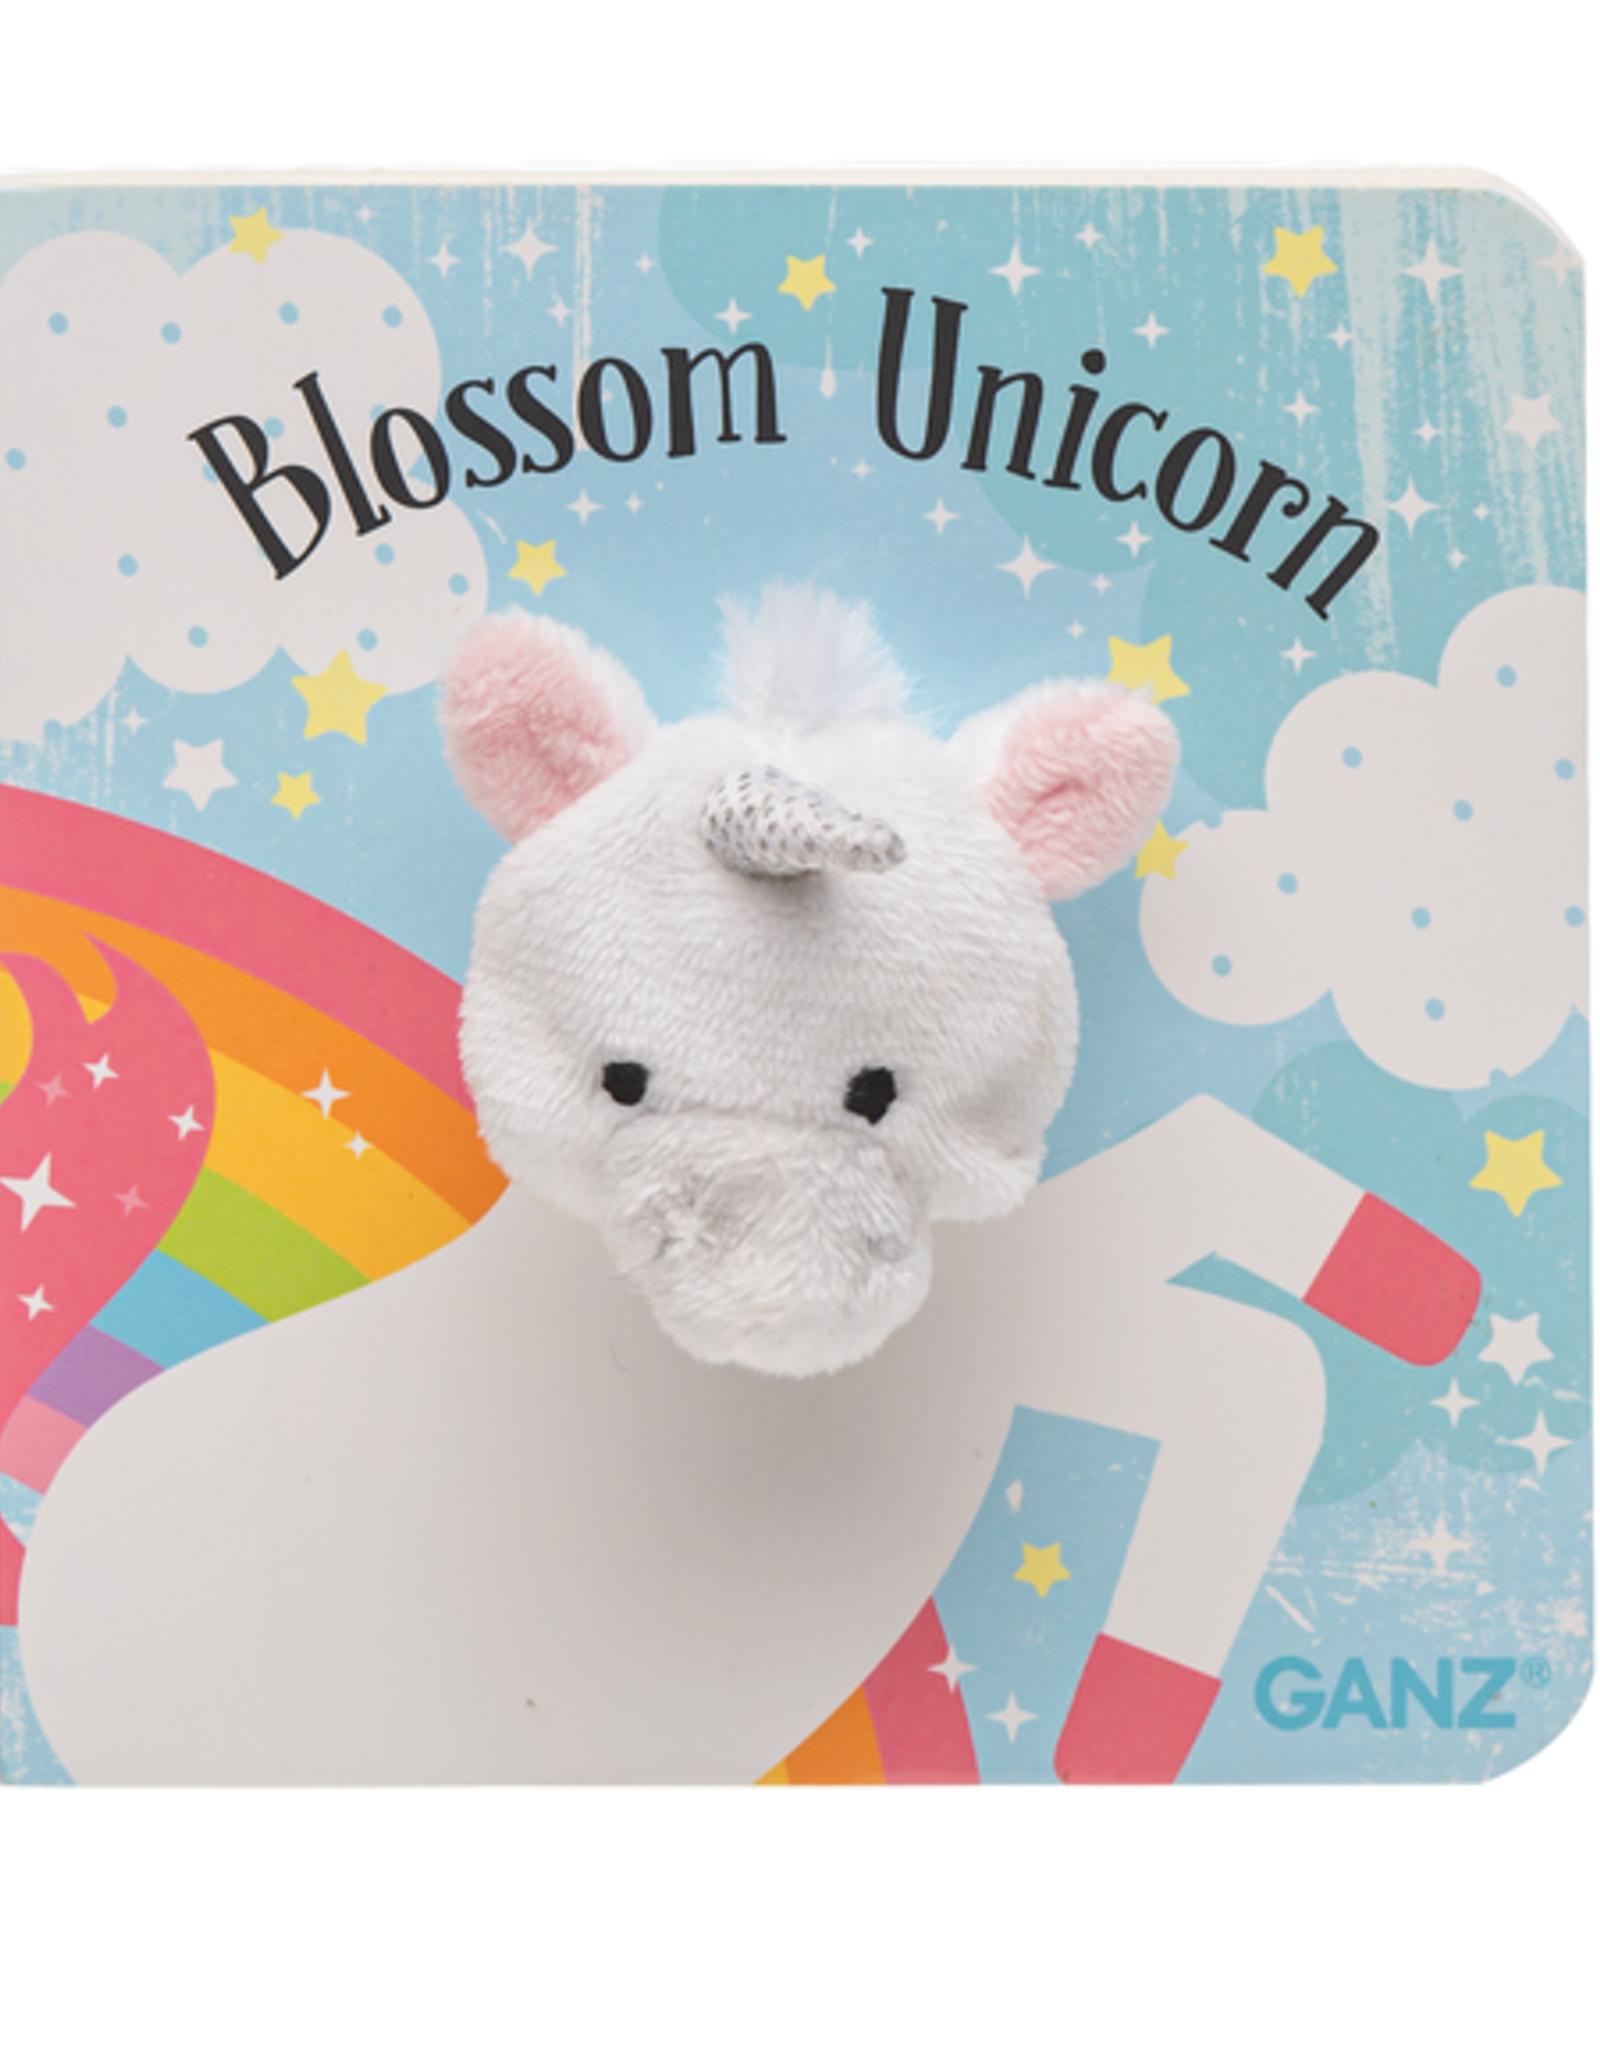 GANZ Blossom Unicorn Finger Puppet Book